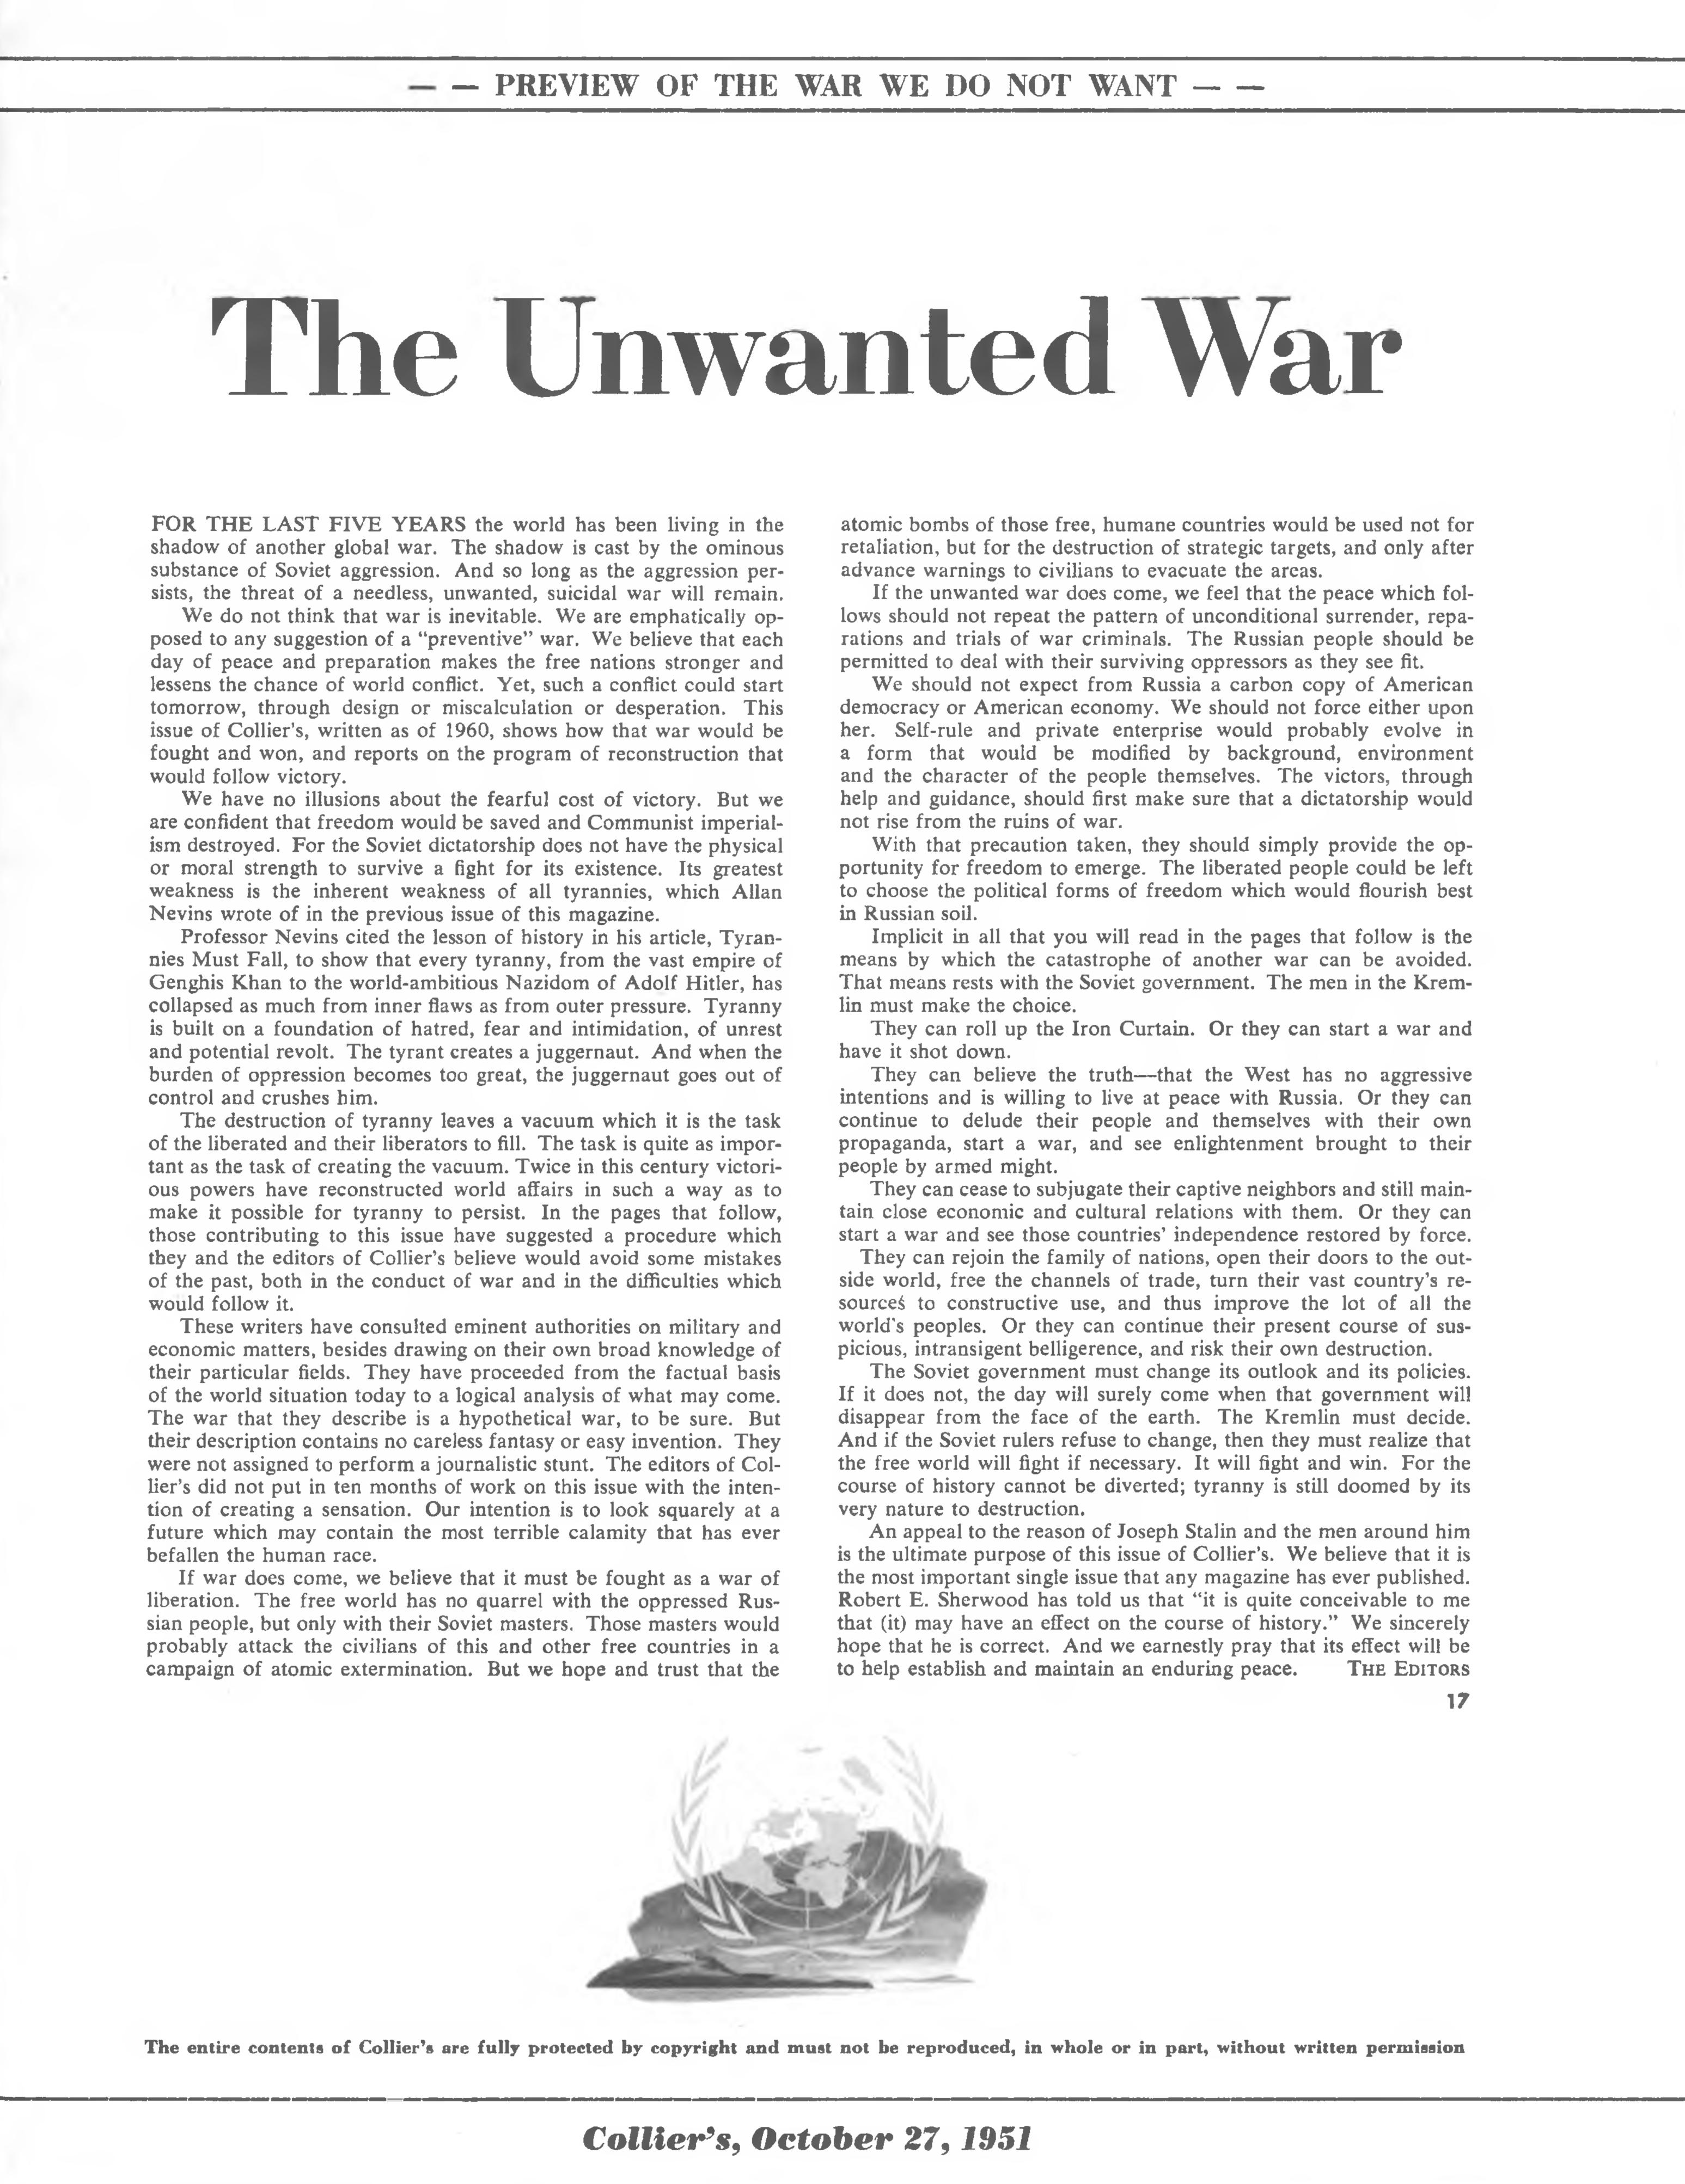 Collier's Weekly, 27 October 1951-17.jpg